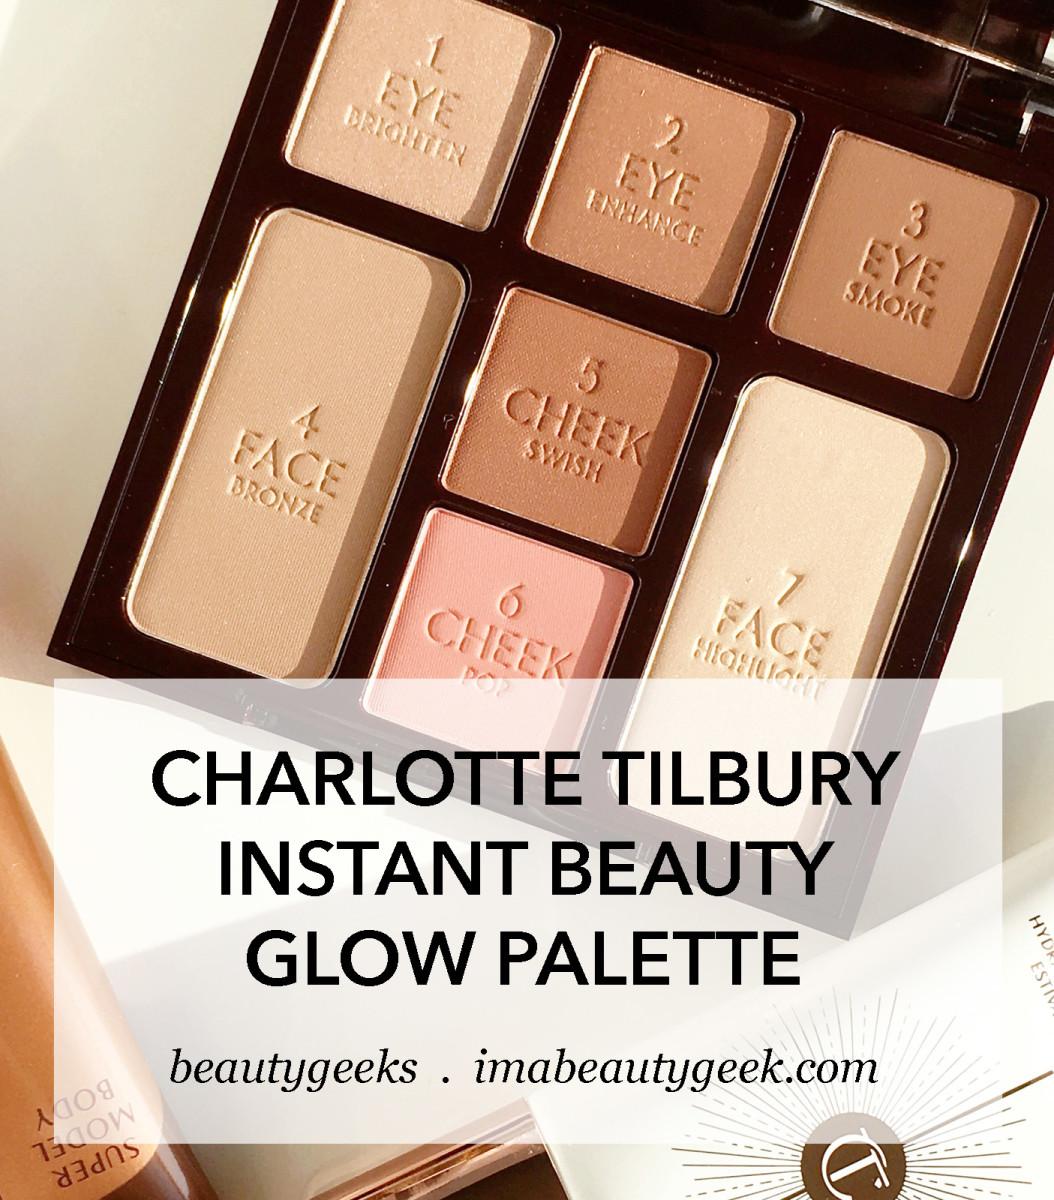 Charlotte Tilbury Instant Beauty Glow Palette (2017)